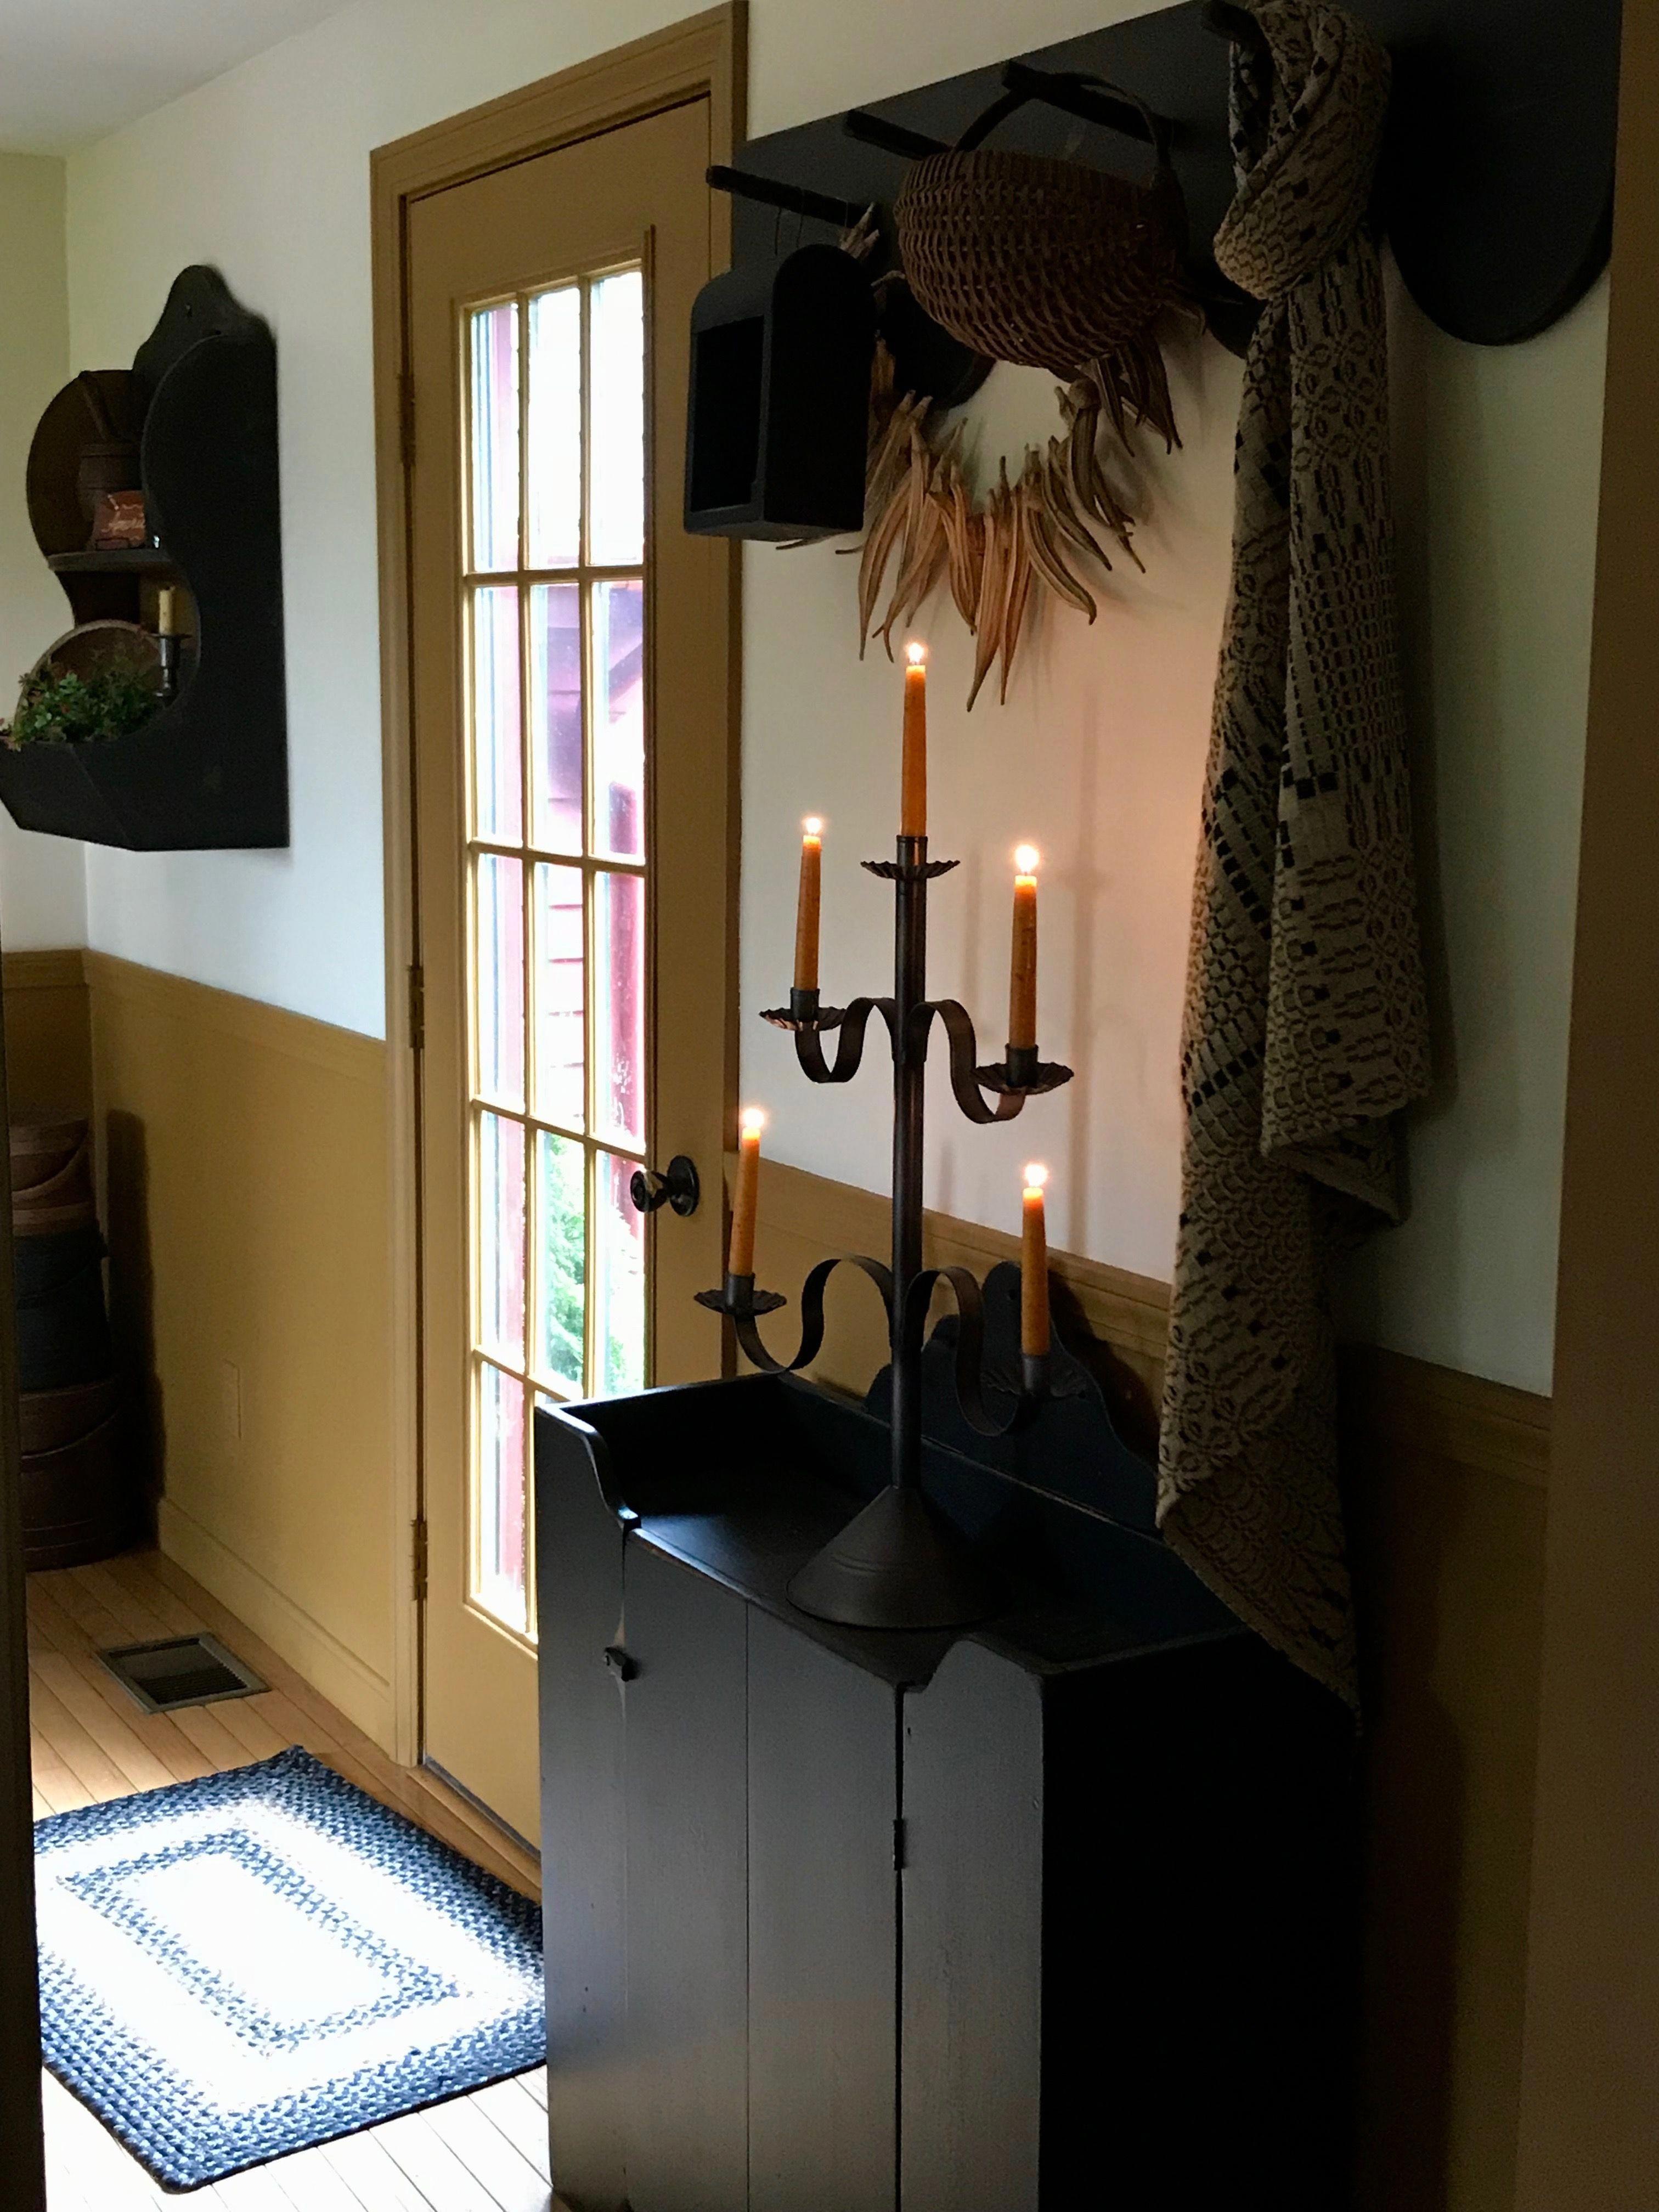 Primitive Black Mustard Diningroomideas Primitive Dining Rooms Primitive Decorating Country Primitive Homes